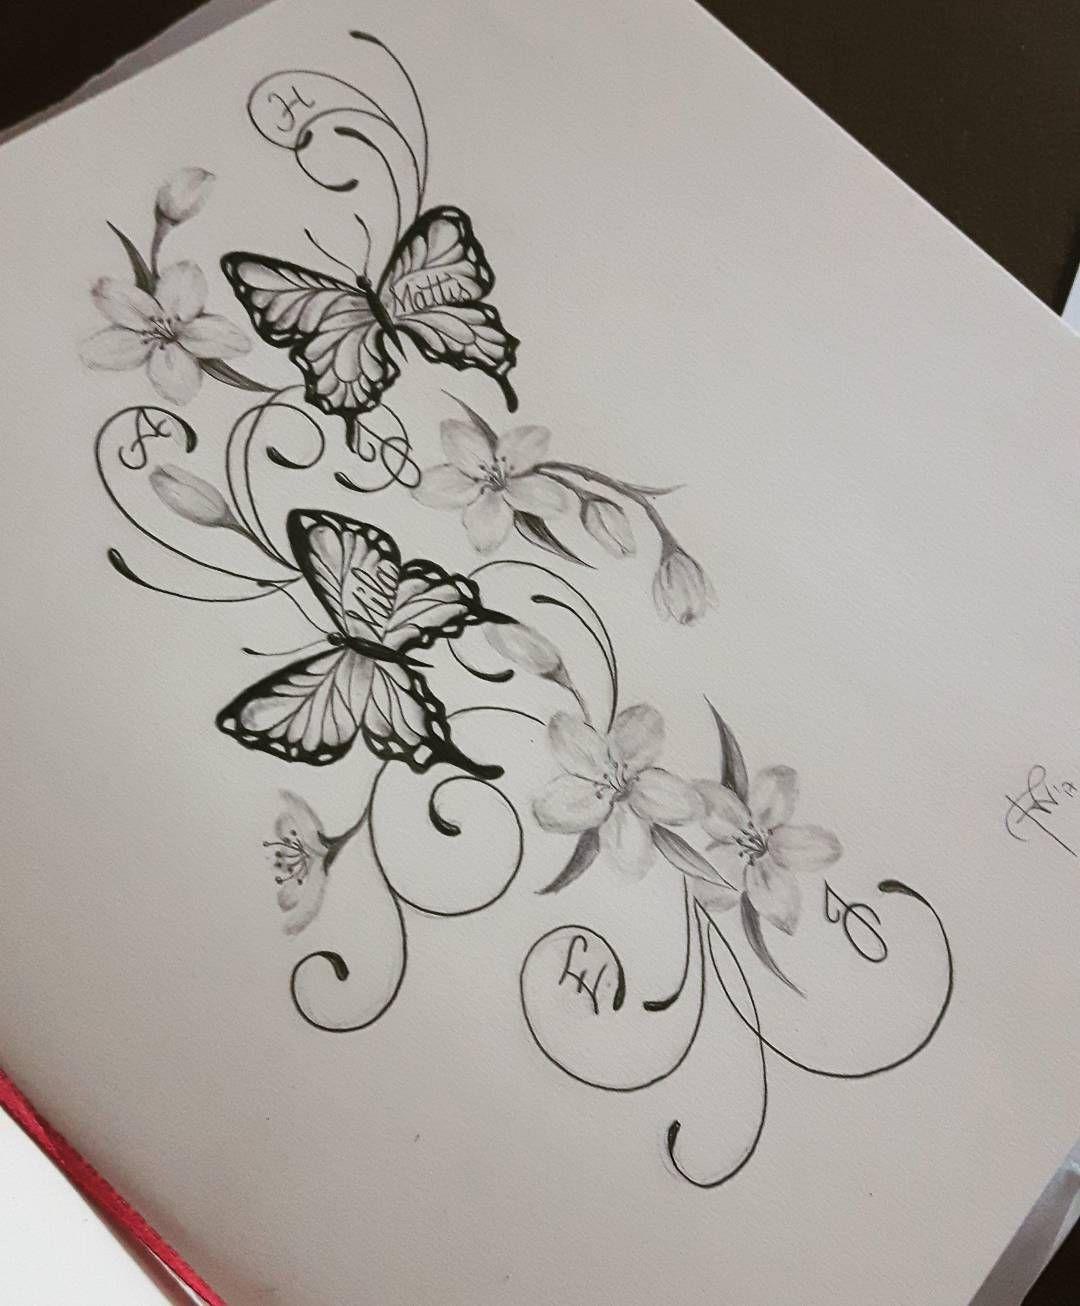 Tattoo Tattooidea Tattoodesign Love Name Flower